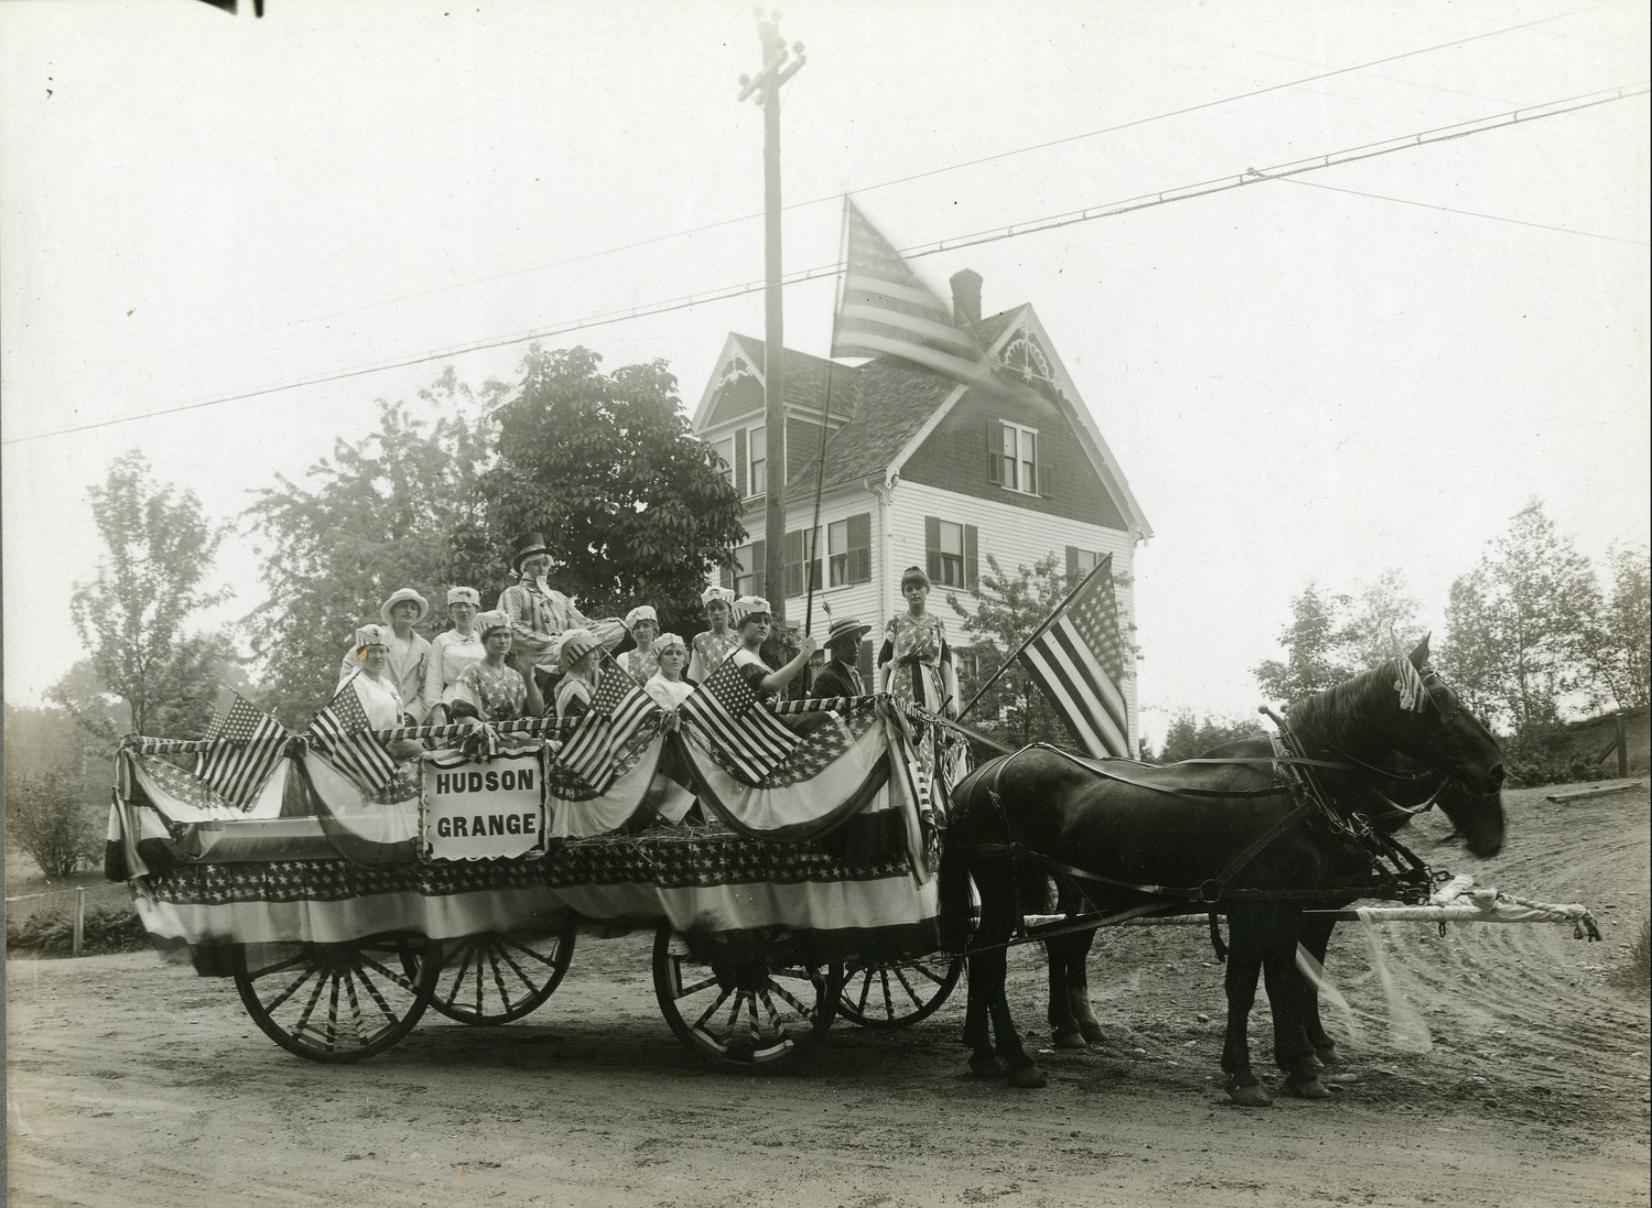 Hudson Grange Parade Float, 1916.